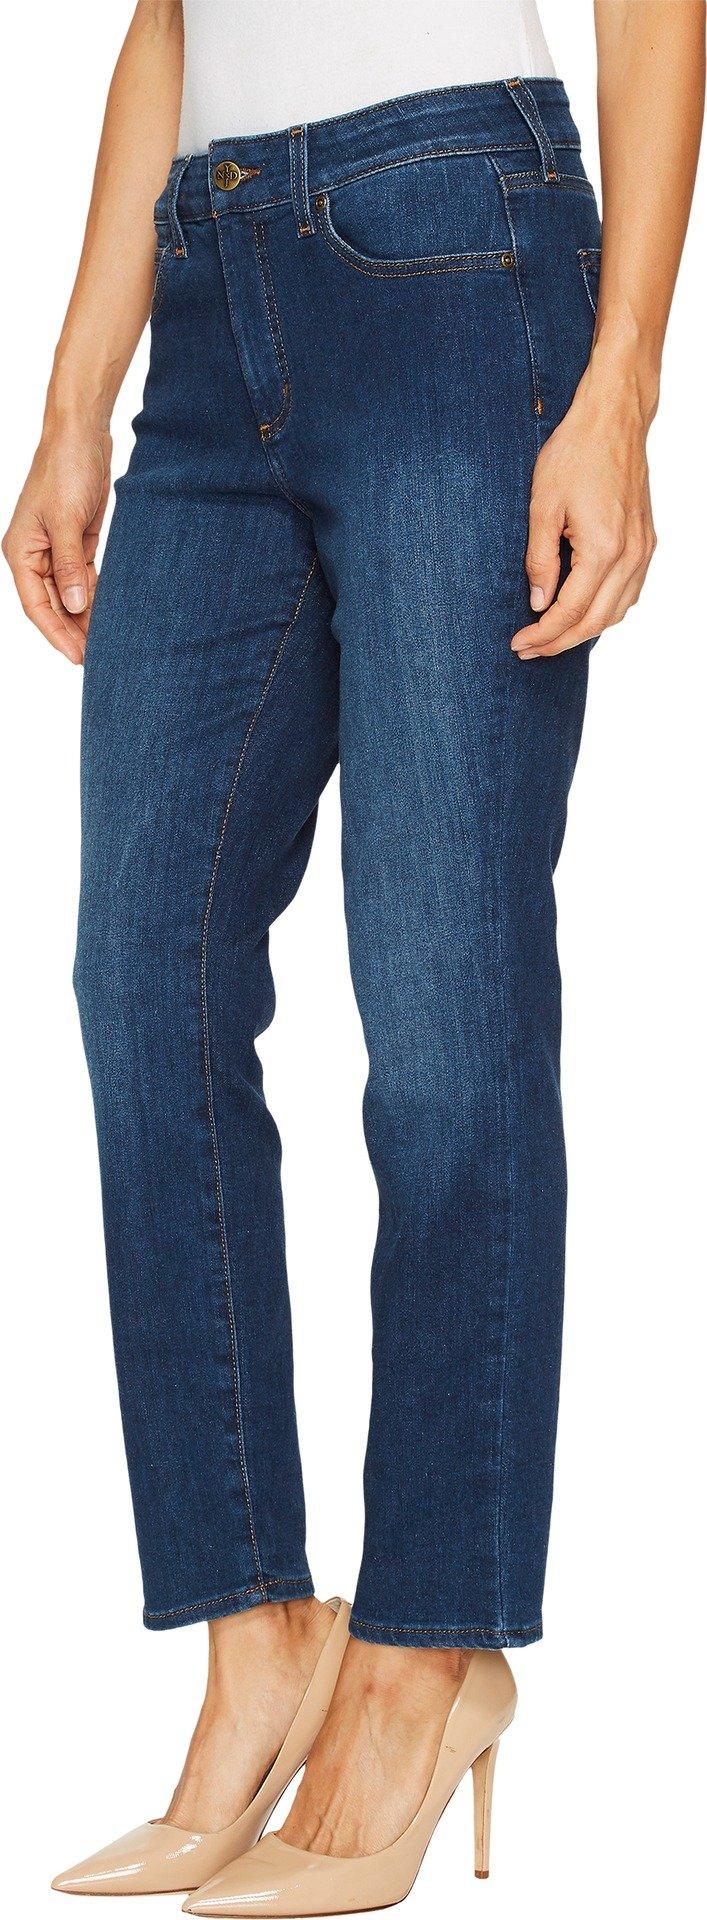 NYDJ Women's Petite Size Alina Legging Jeans, cooper, 12P by NYDJ (Image #1)